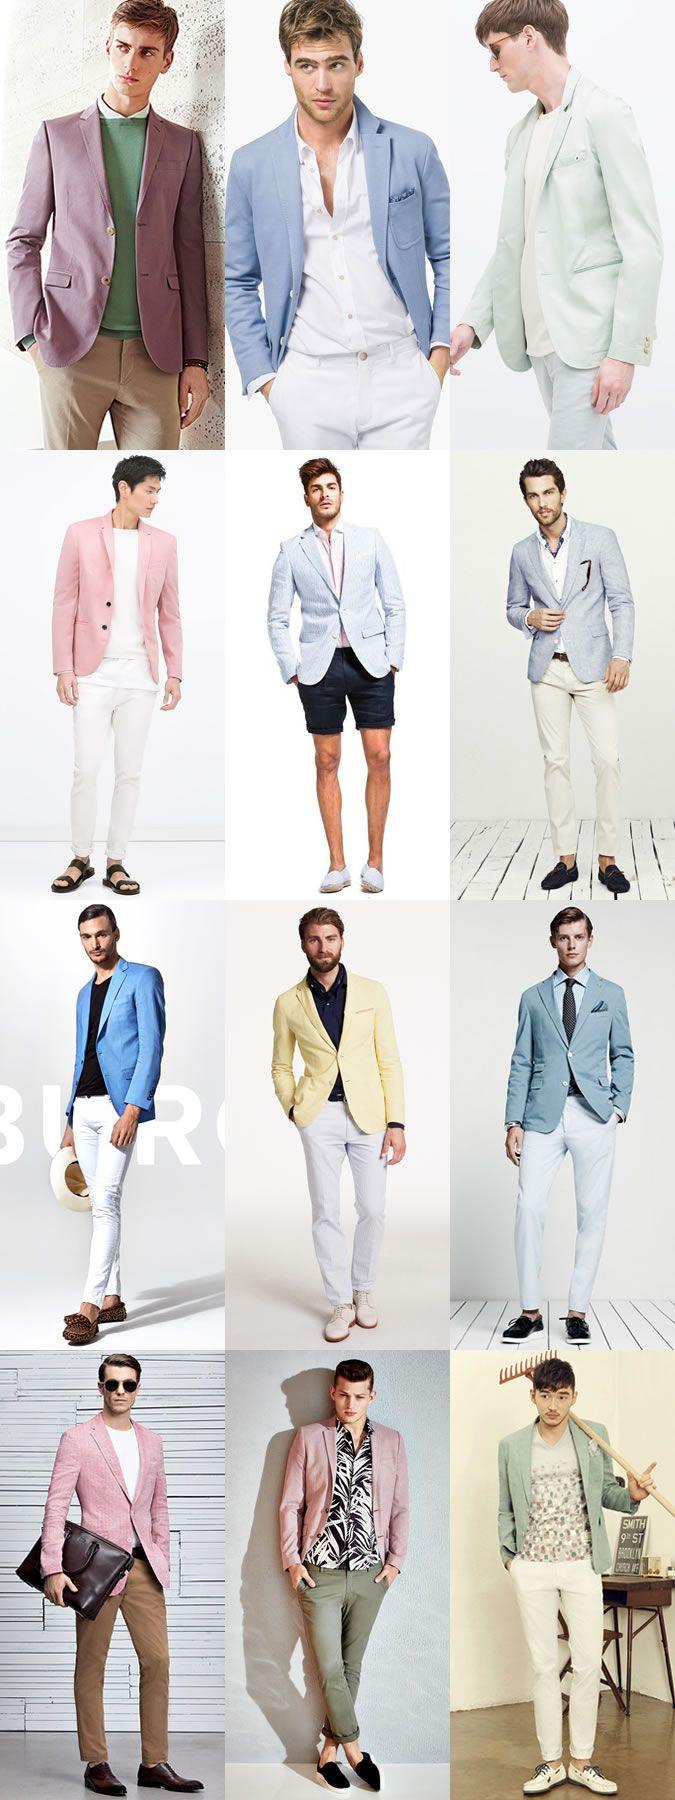 best sandalias images on pinterest man style menus clothing